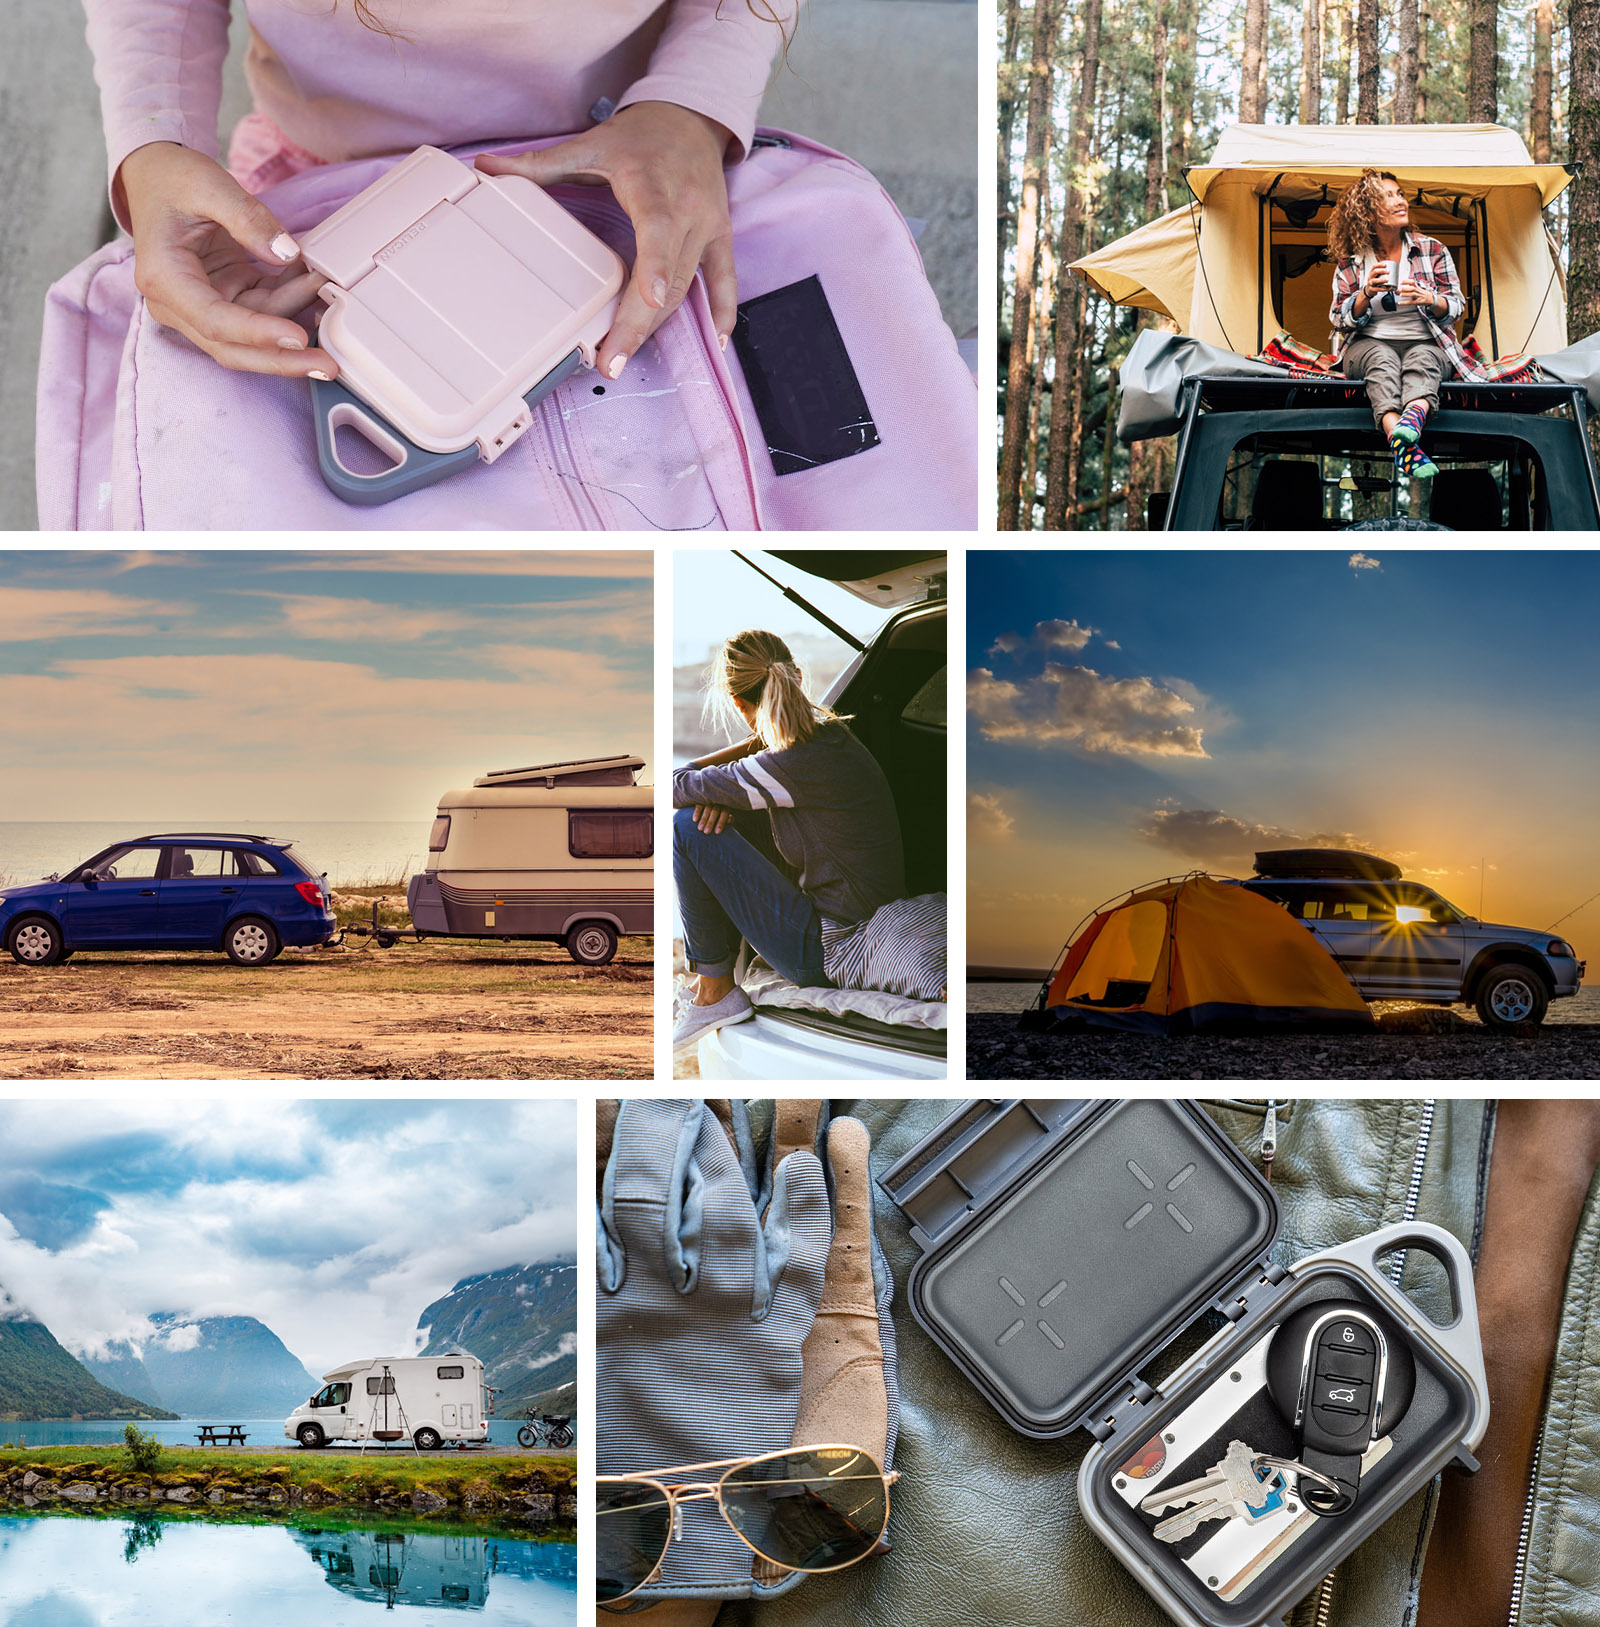 go case travel car camping